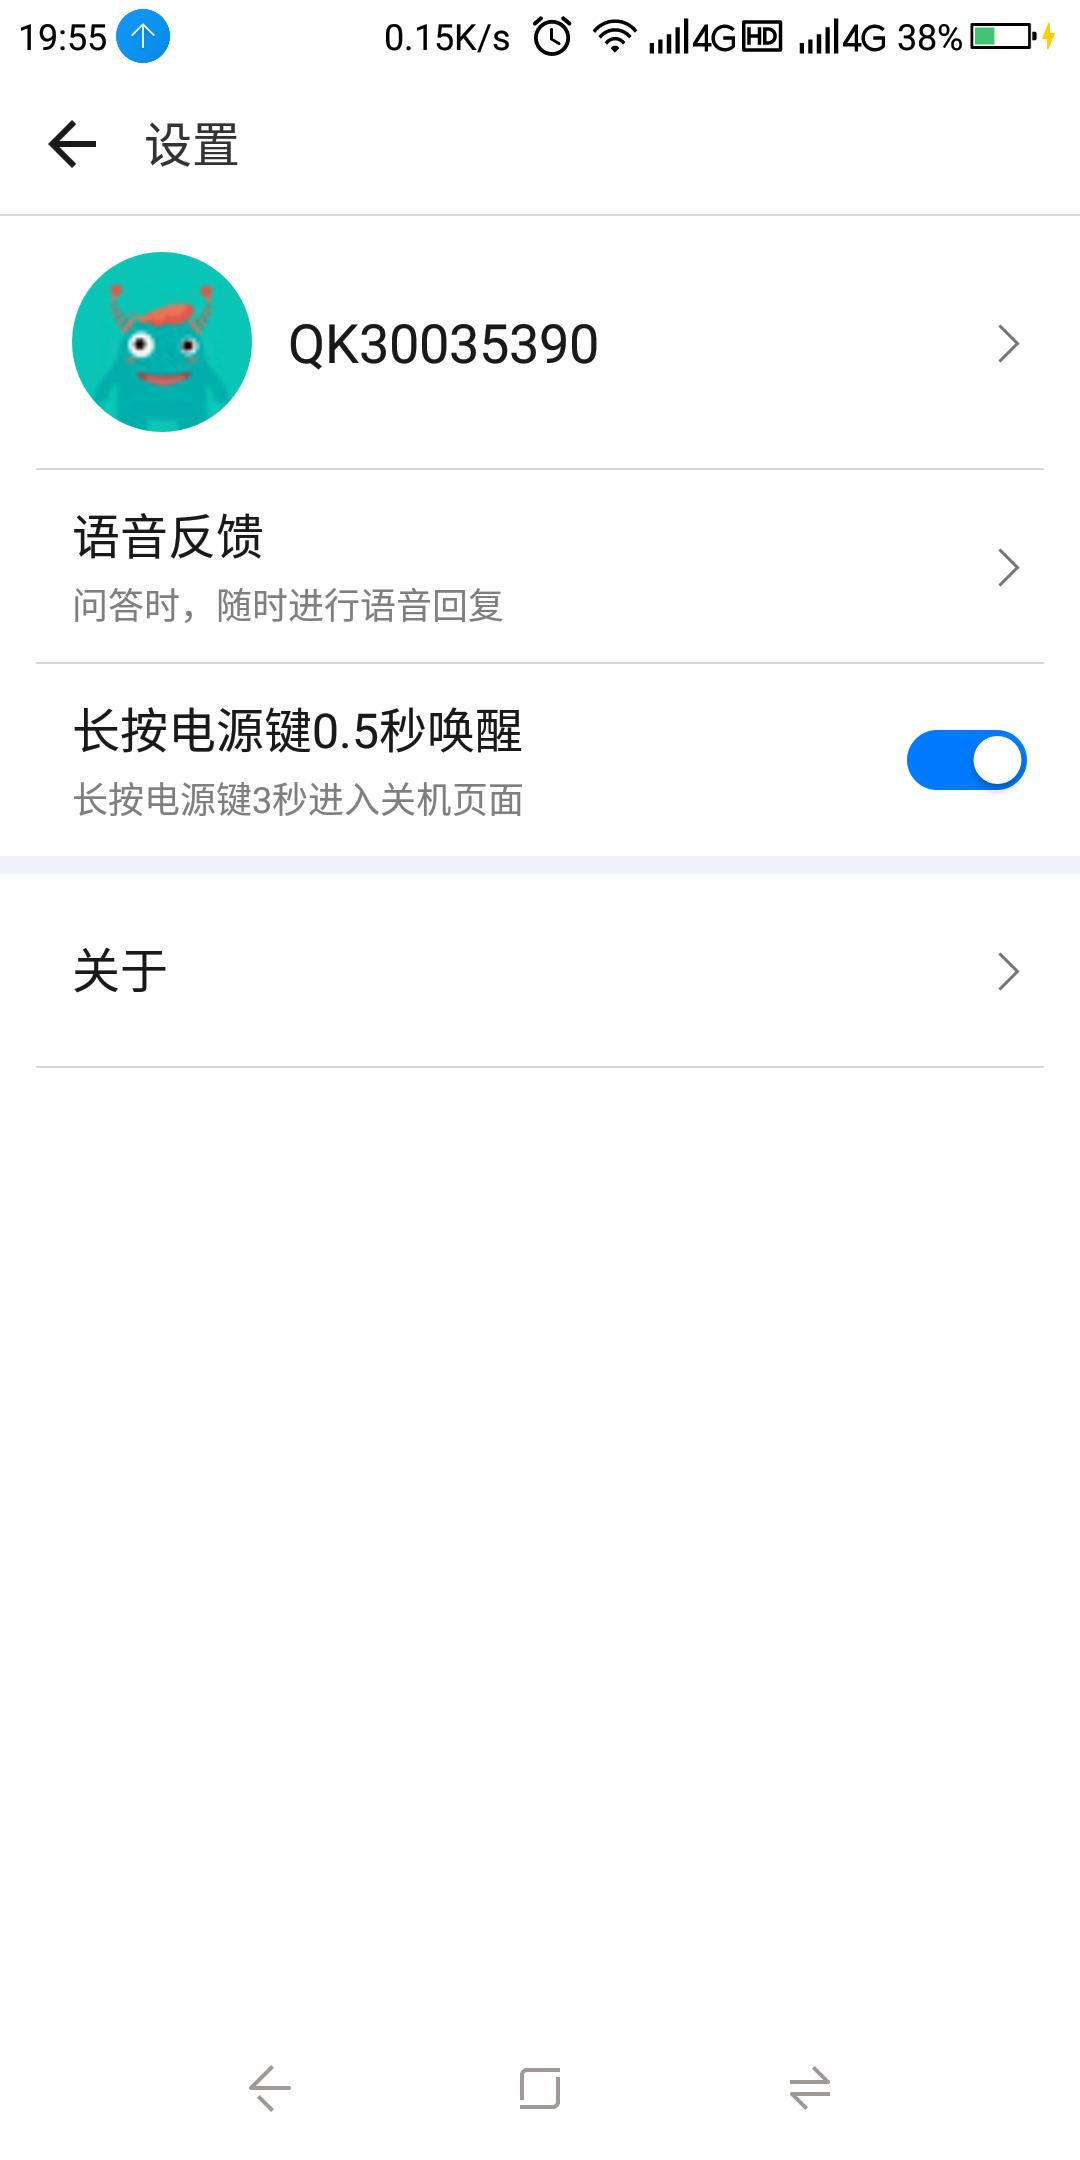 Screenshot_2018-09-30-19-55-48.png